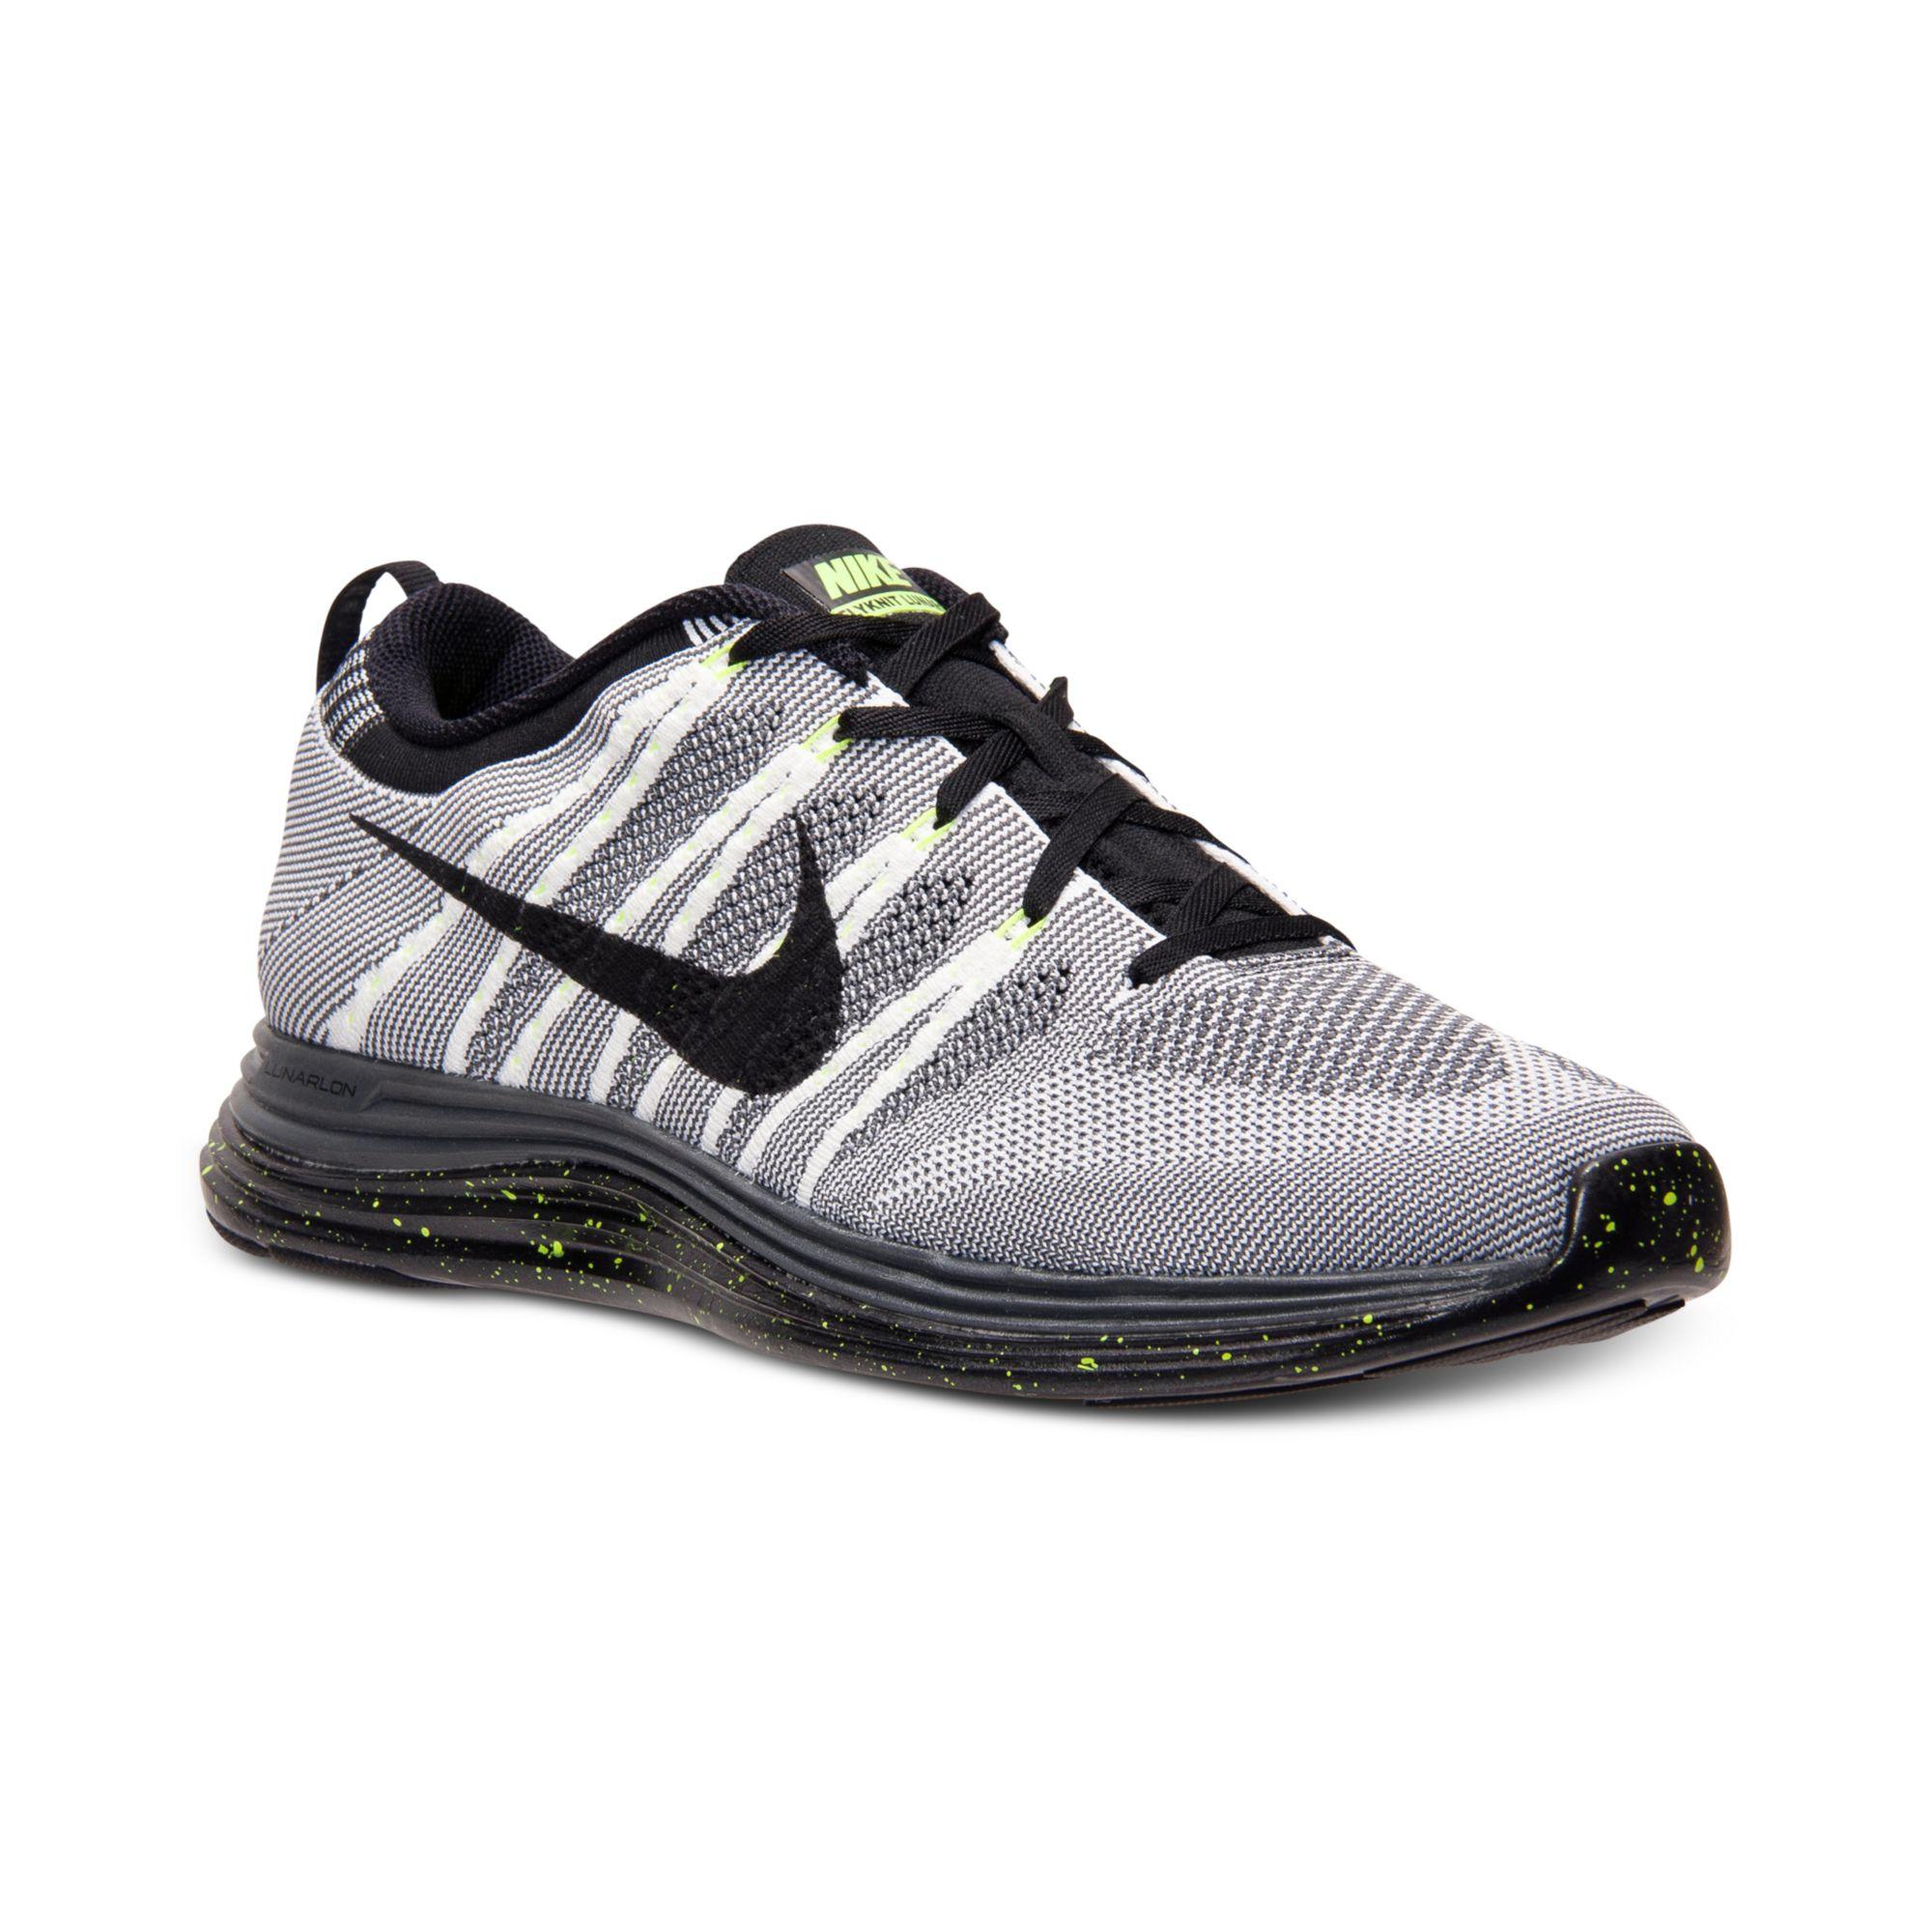 Lyst - Nike Mens Flyknit Lunar 1 Running Sneakers From Finish Line in Black for  Men